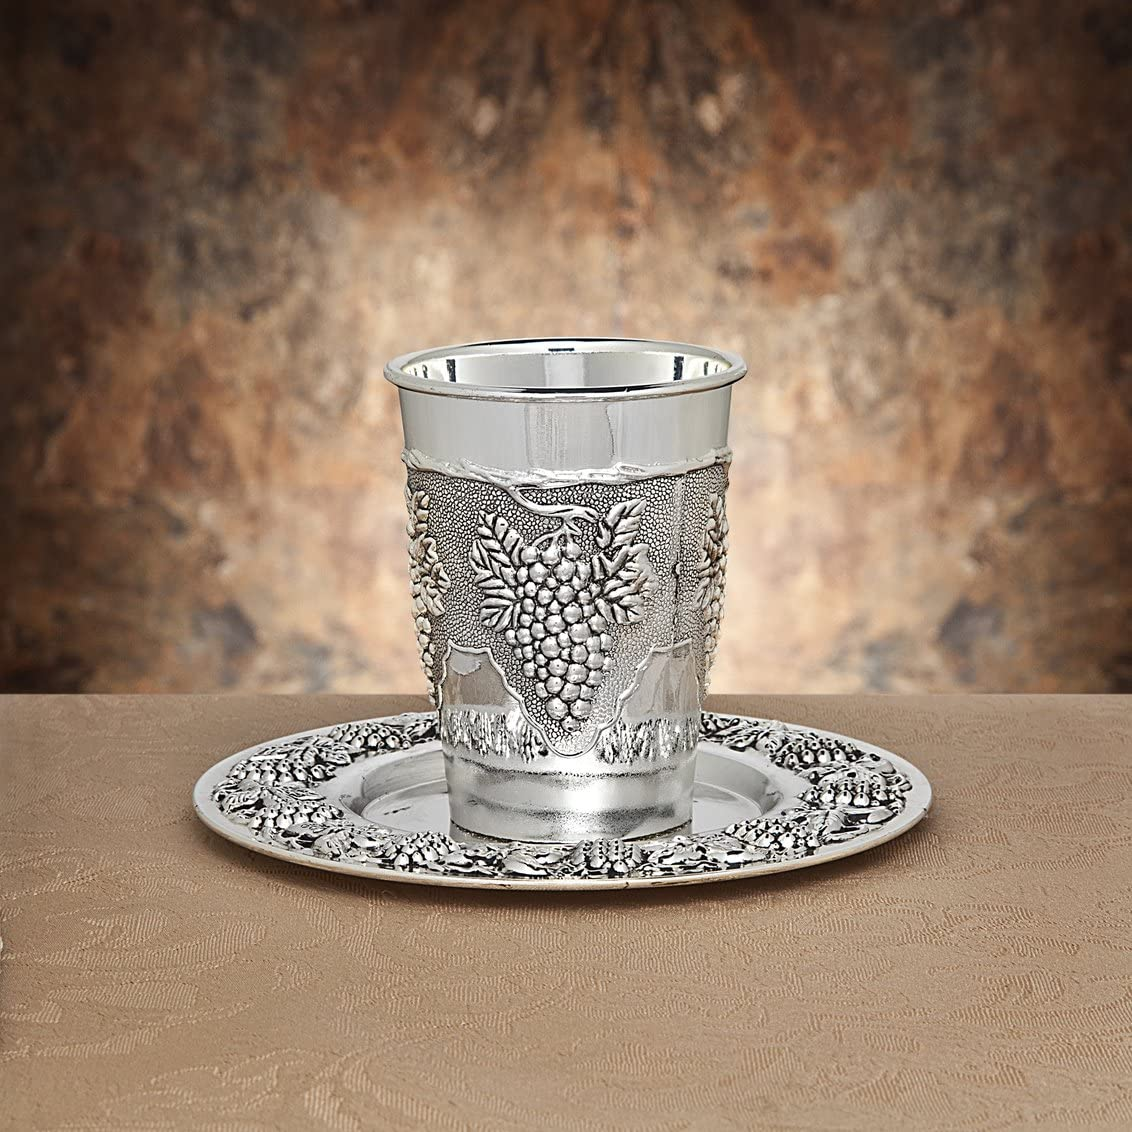 Studio Silversmiths 5 San Francisco Mall popular Silverplate Cup Kiddush silver-plated